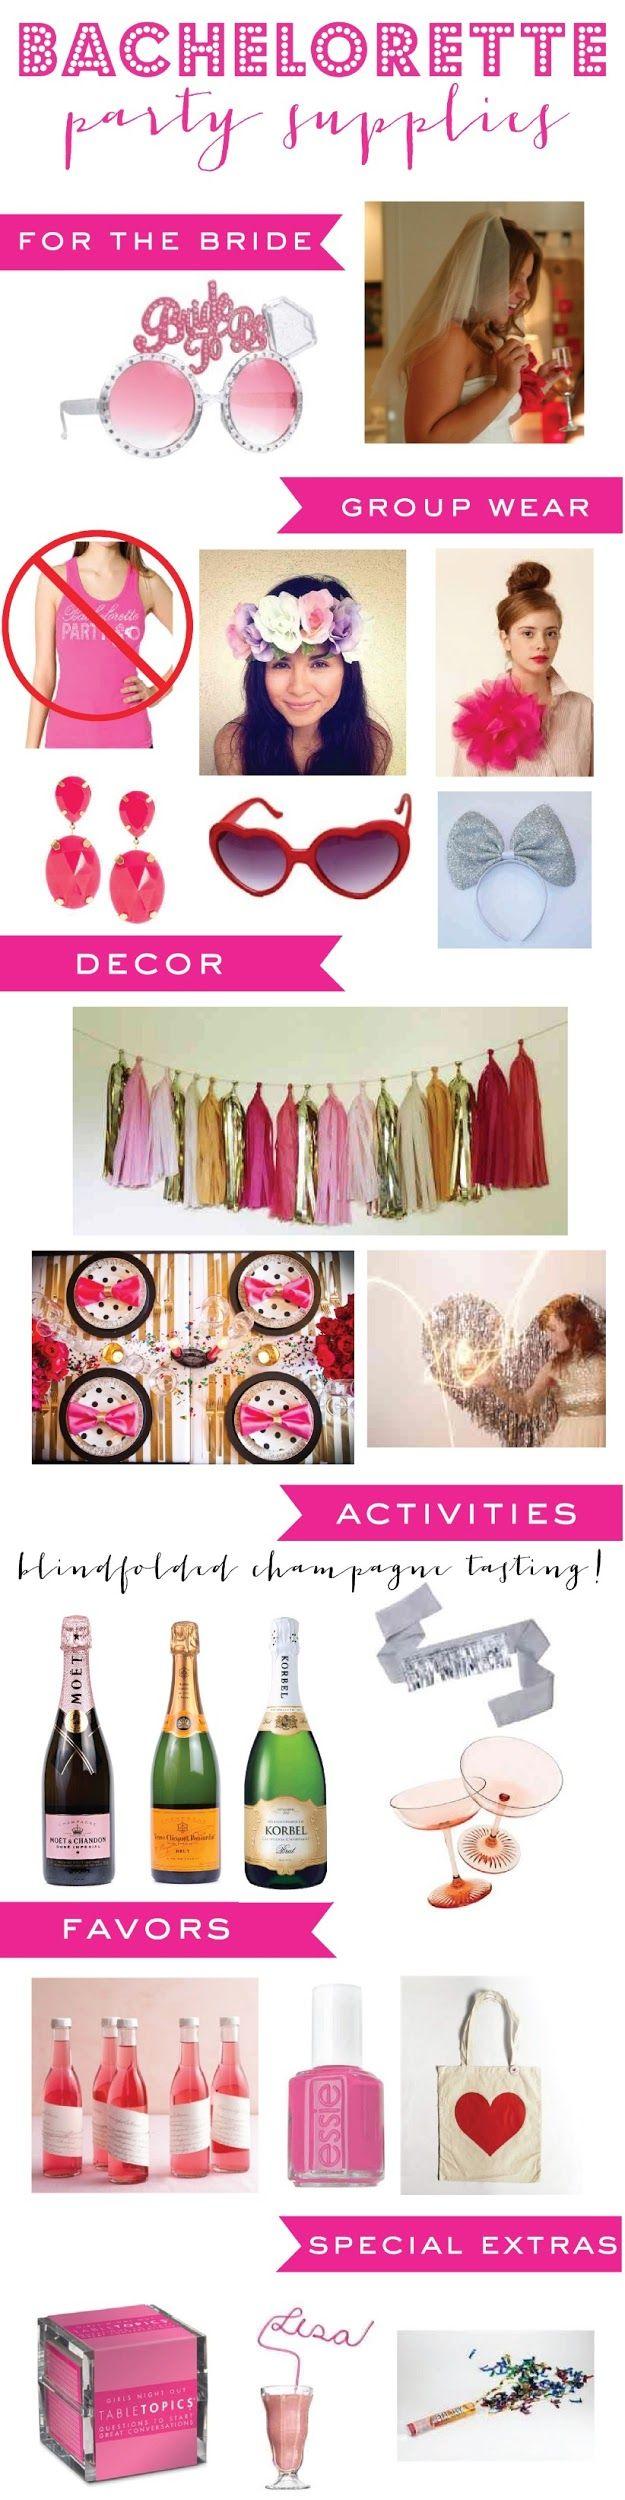 1000 ideas about bachelorette party supplies on pinterest for Bachelorette party decoration packages